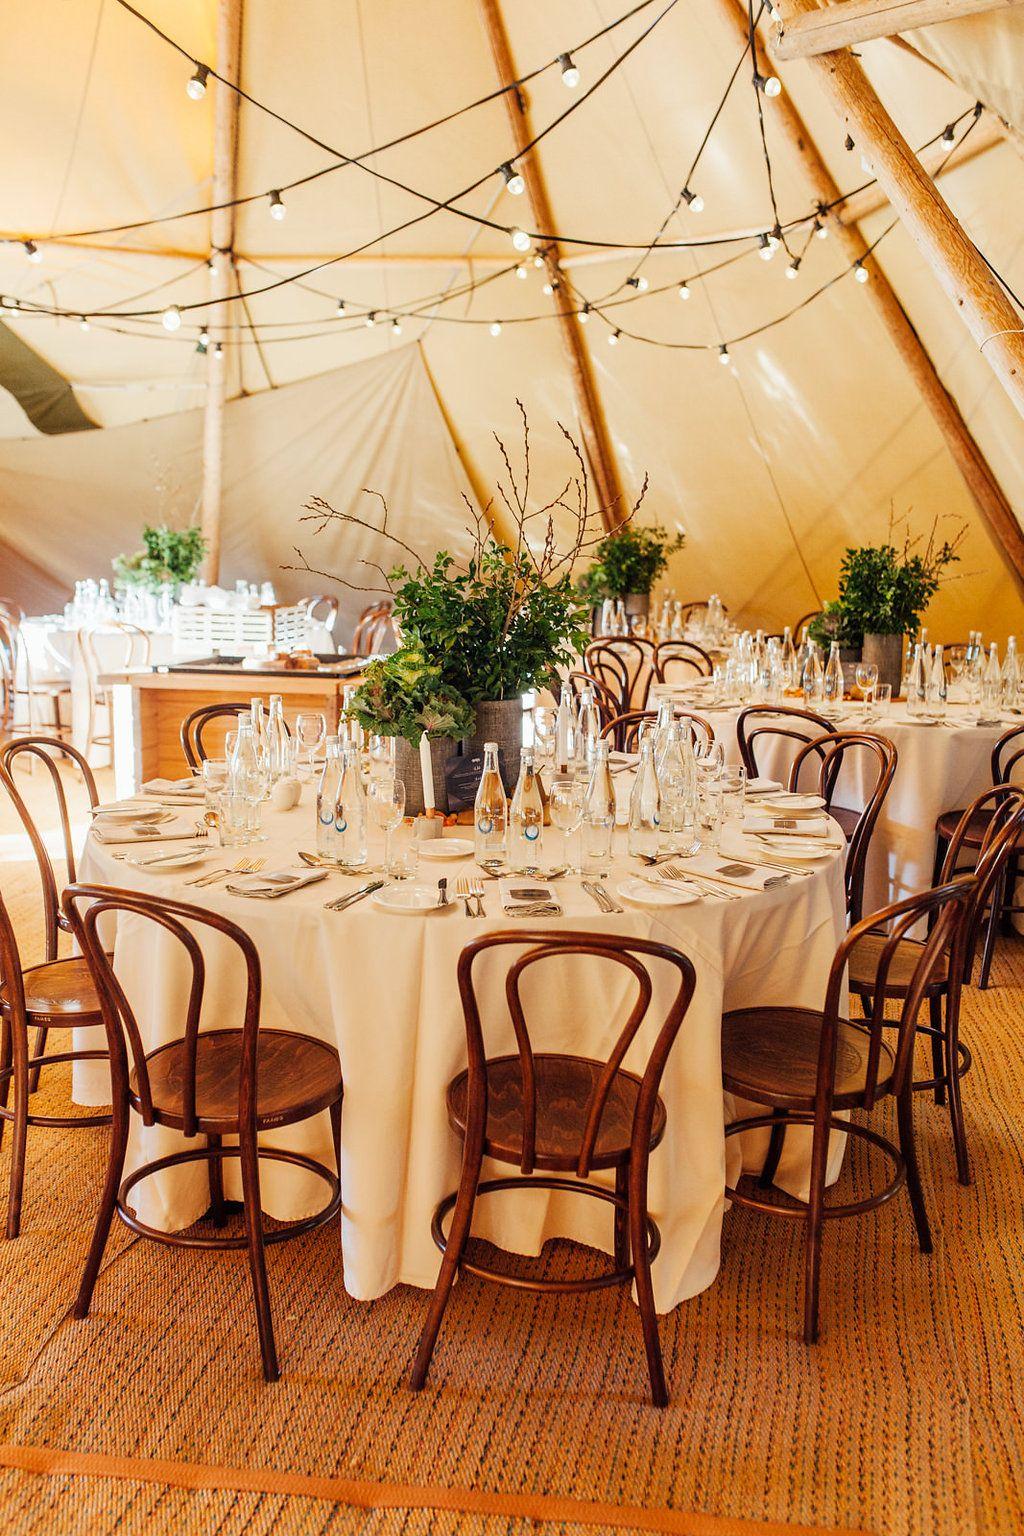 Hampton event hire walnut bentwood chairs sunshine coast corporate event image by when elephant met zebra